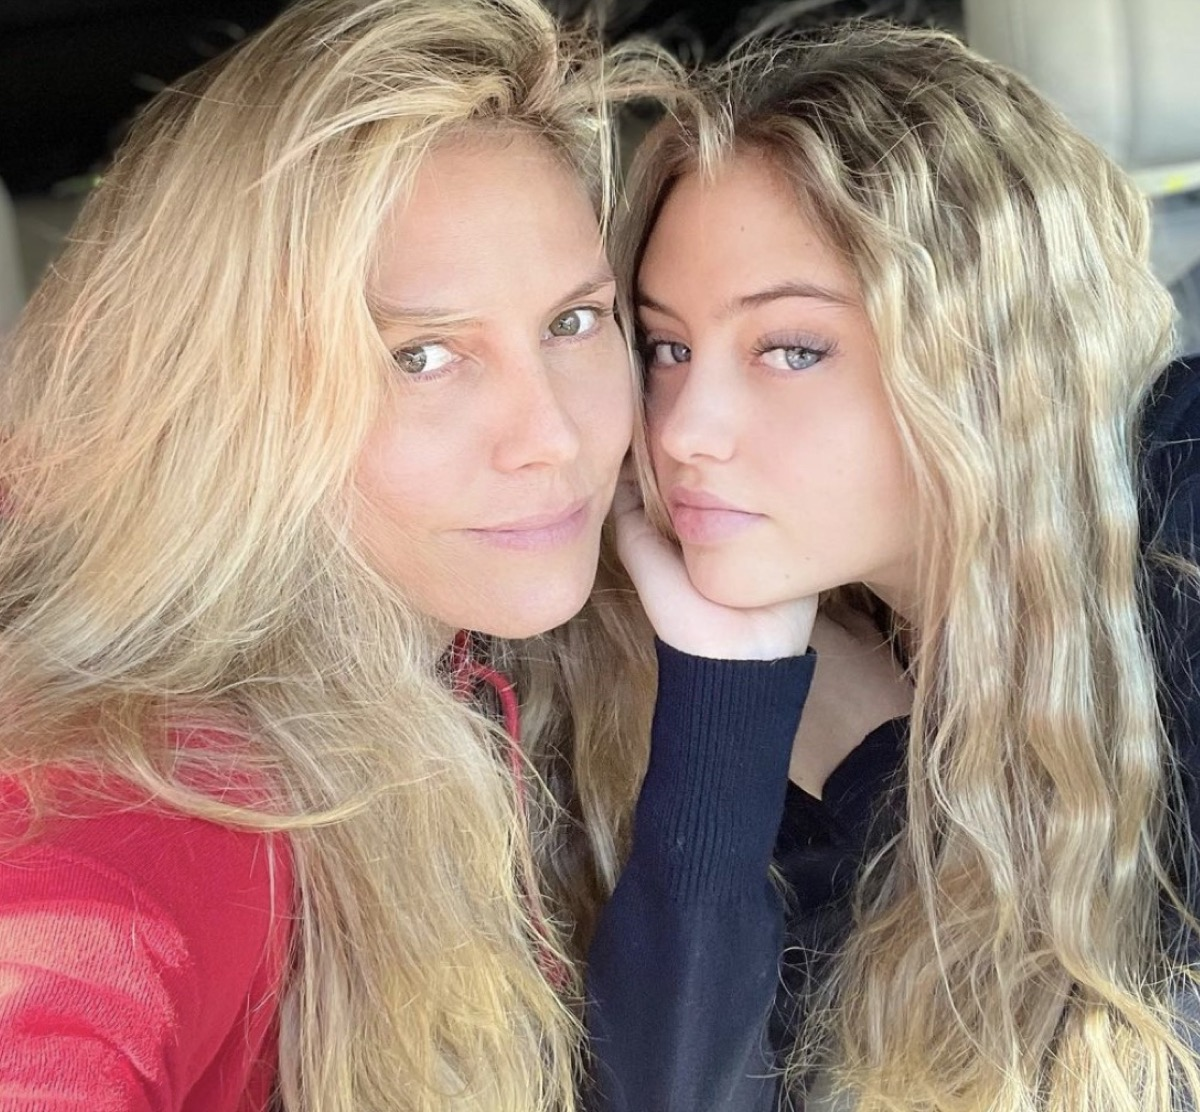 leni klum and heidi klum taking selfie